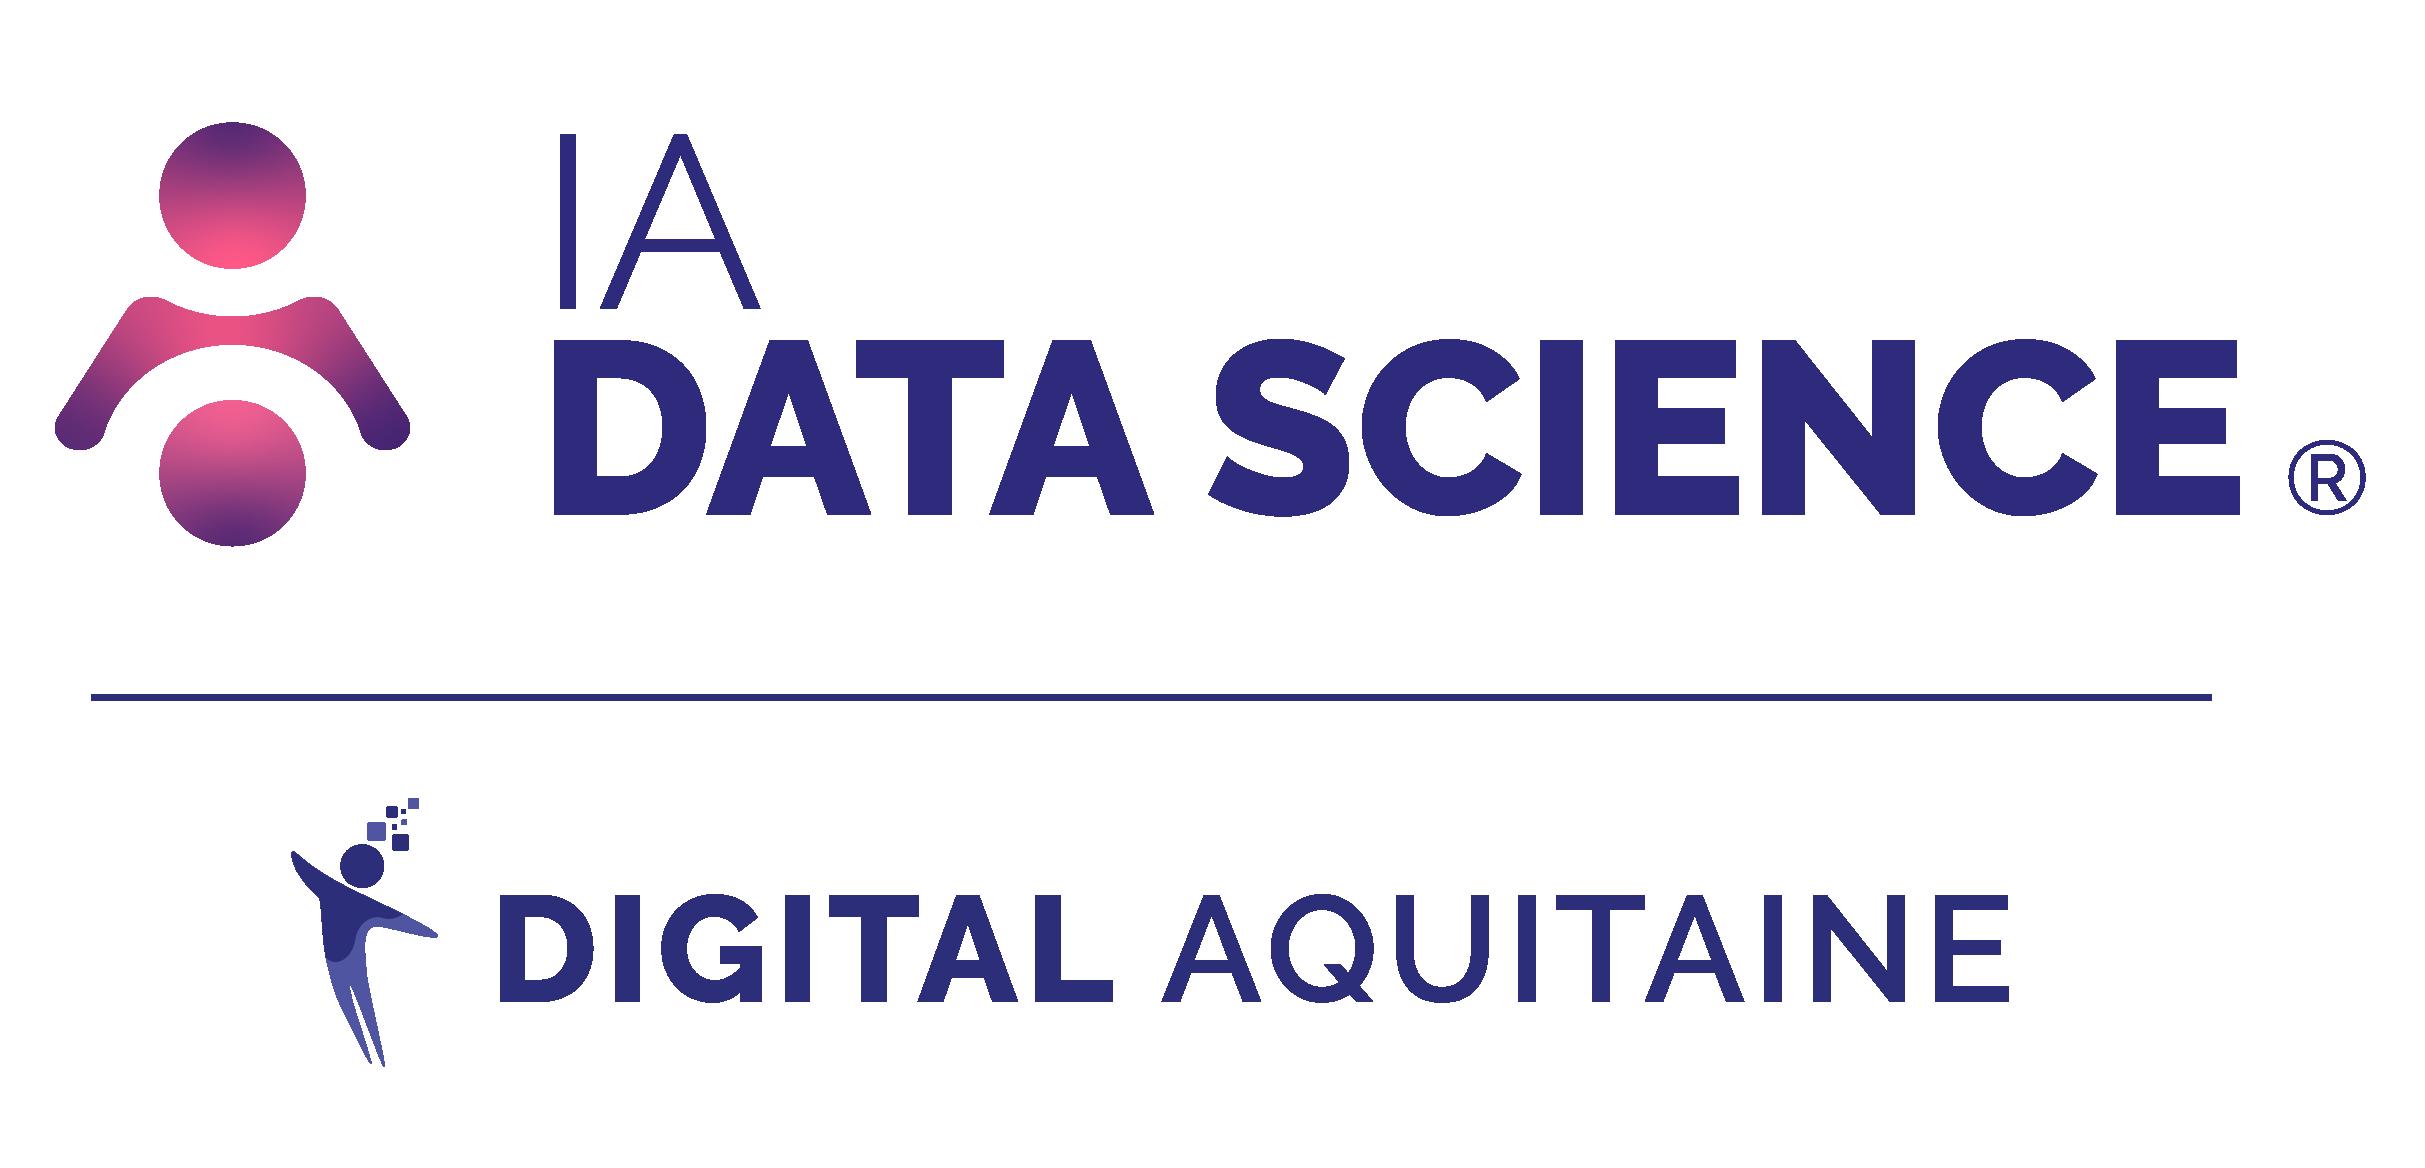 IA Data Science